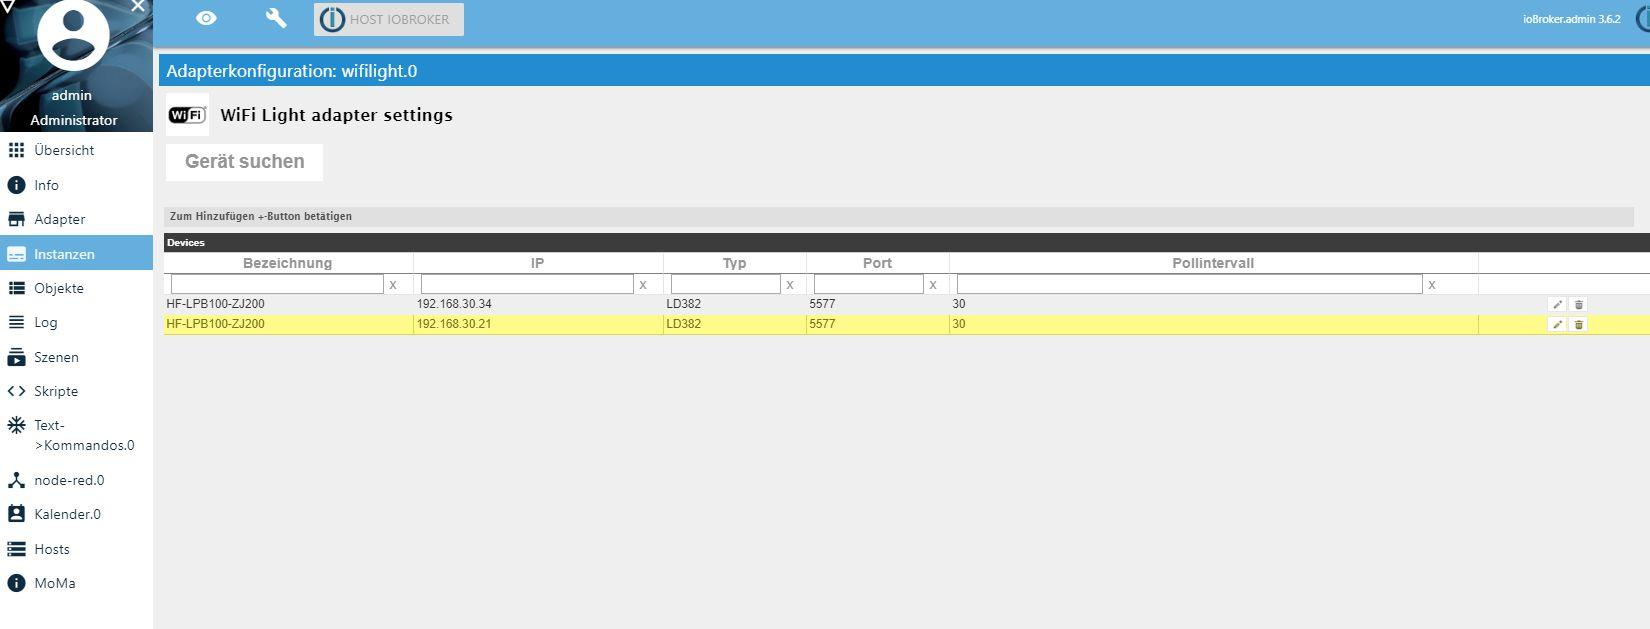 Neuer Adapter] Visualisierung iQontrol